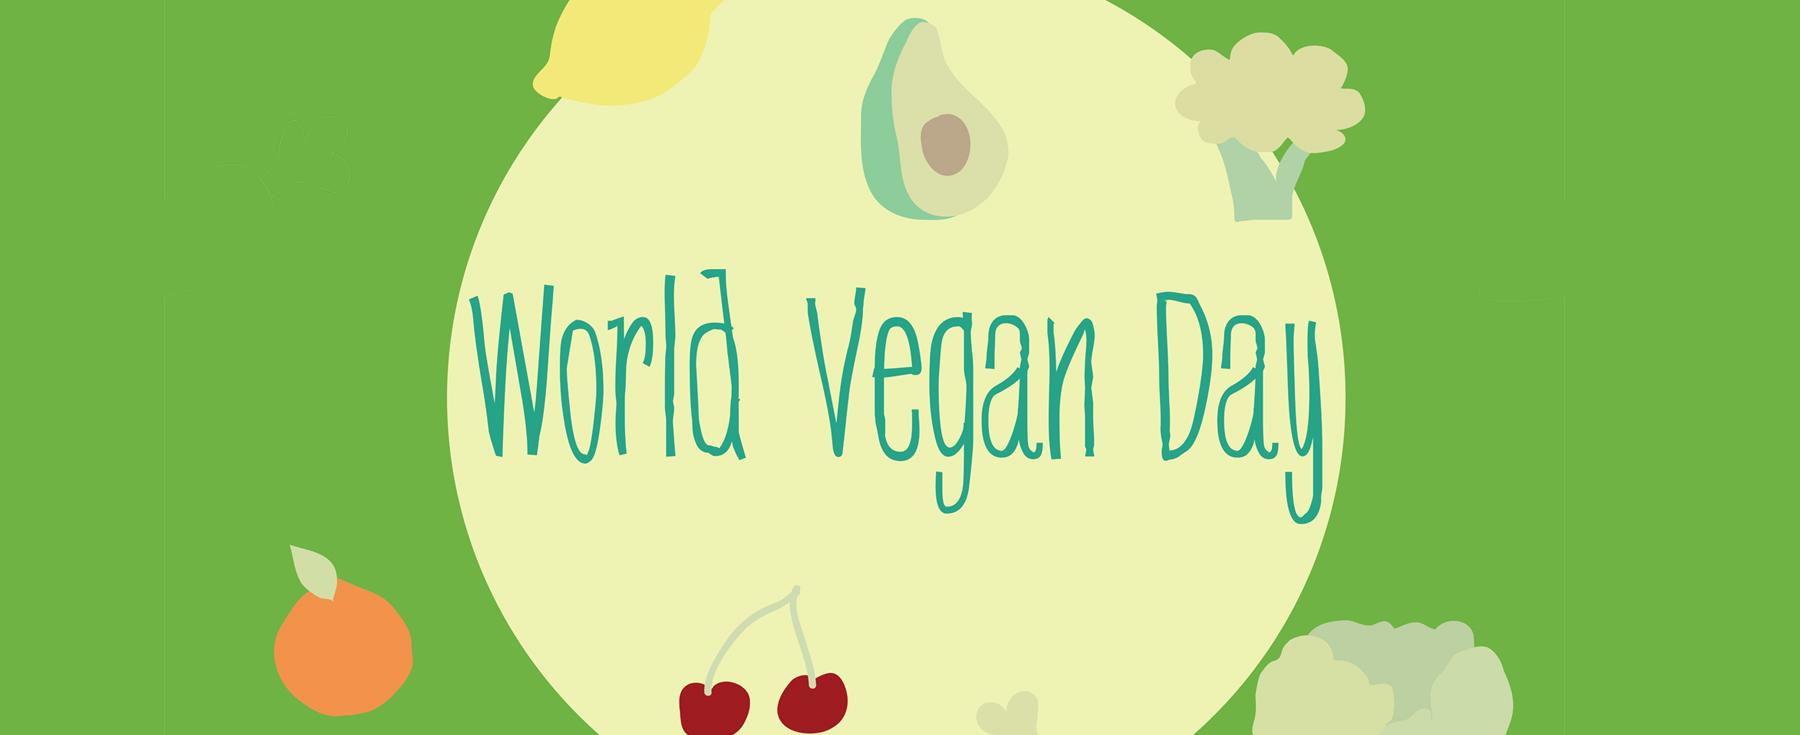 Vegan Drink And Food Festival